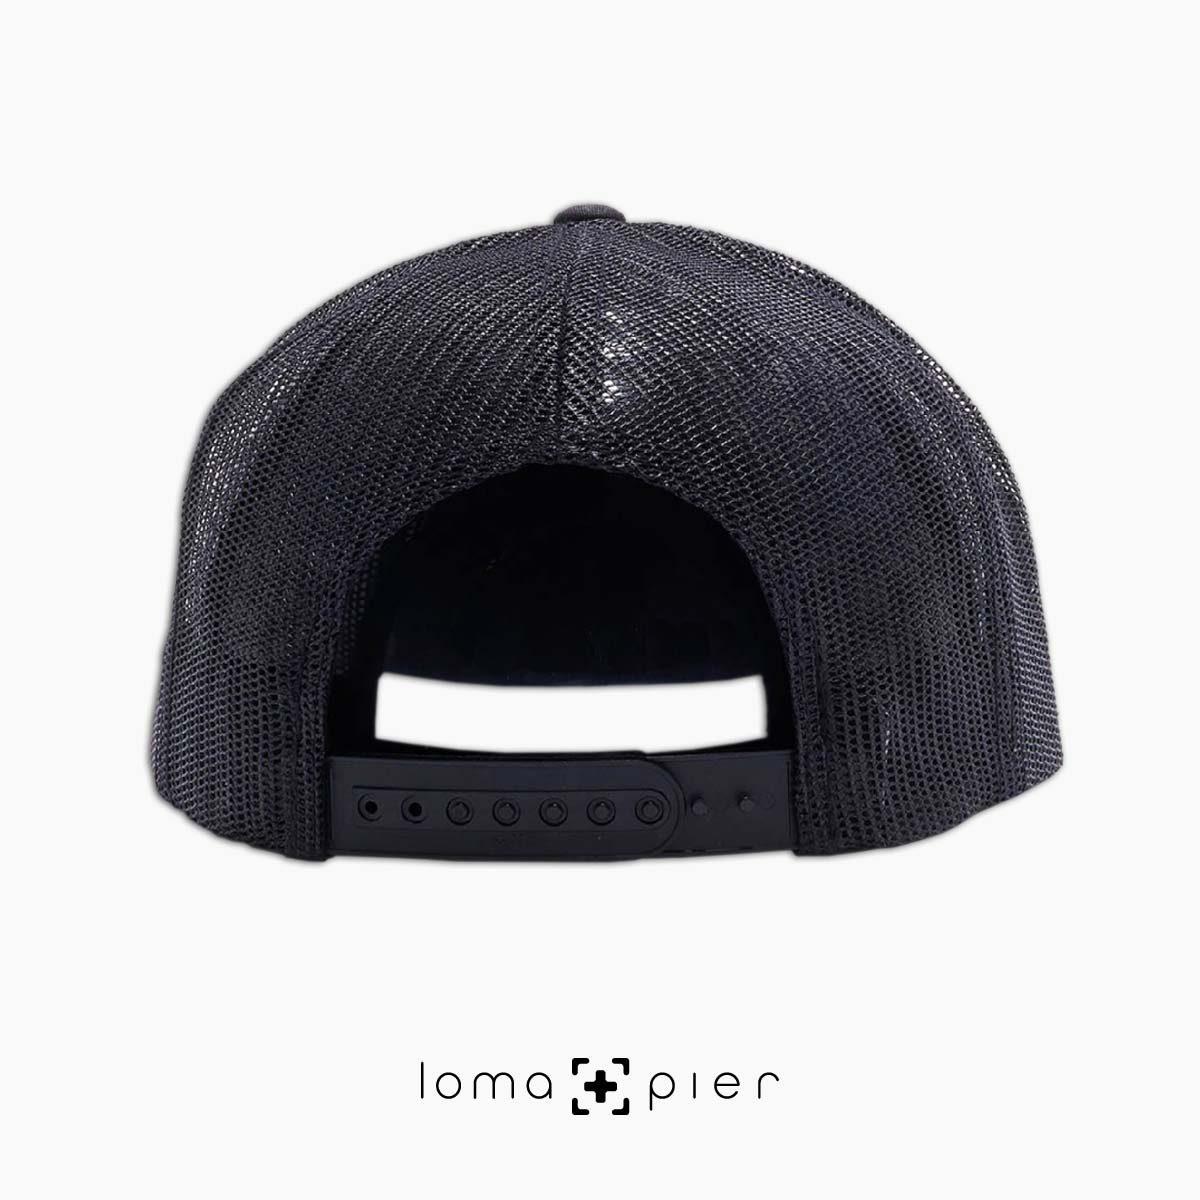 loma+pier beach netback trucker hats